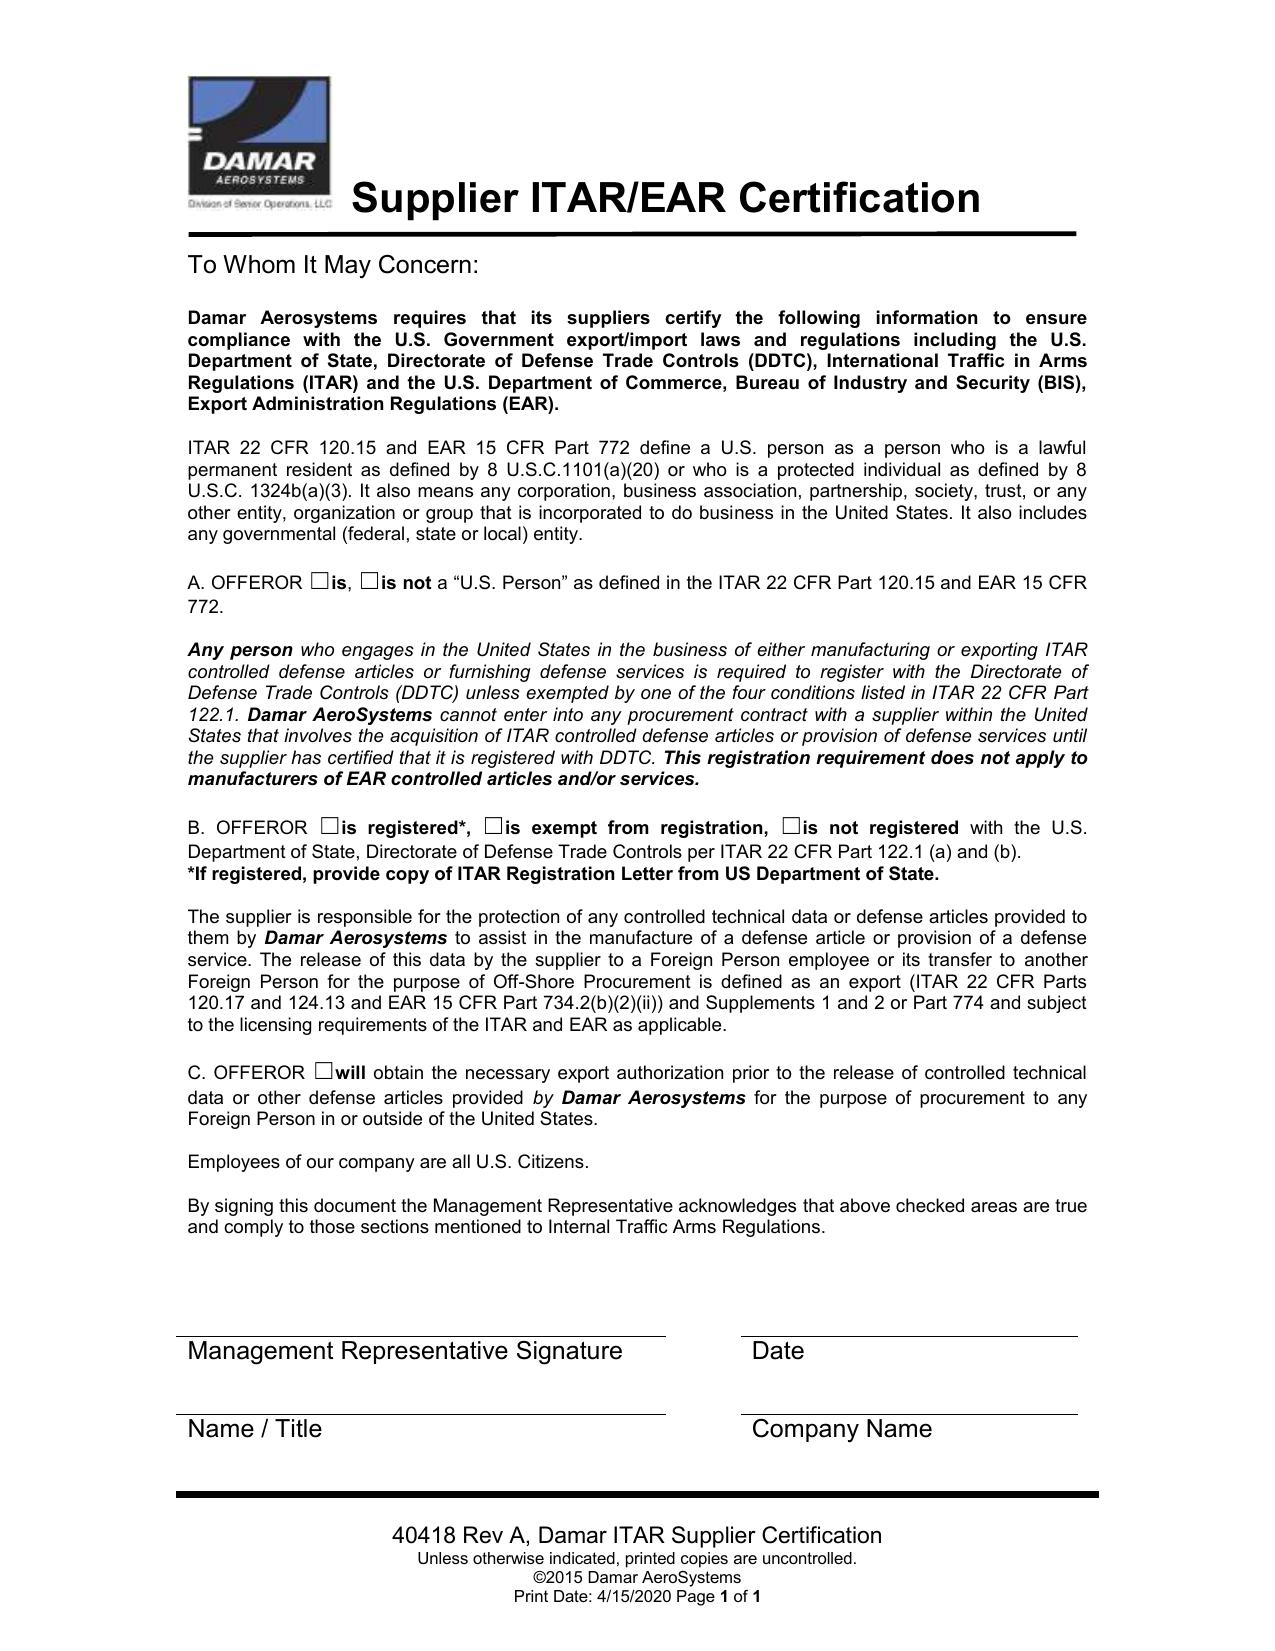 Itar Ear Certification Form